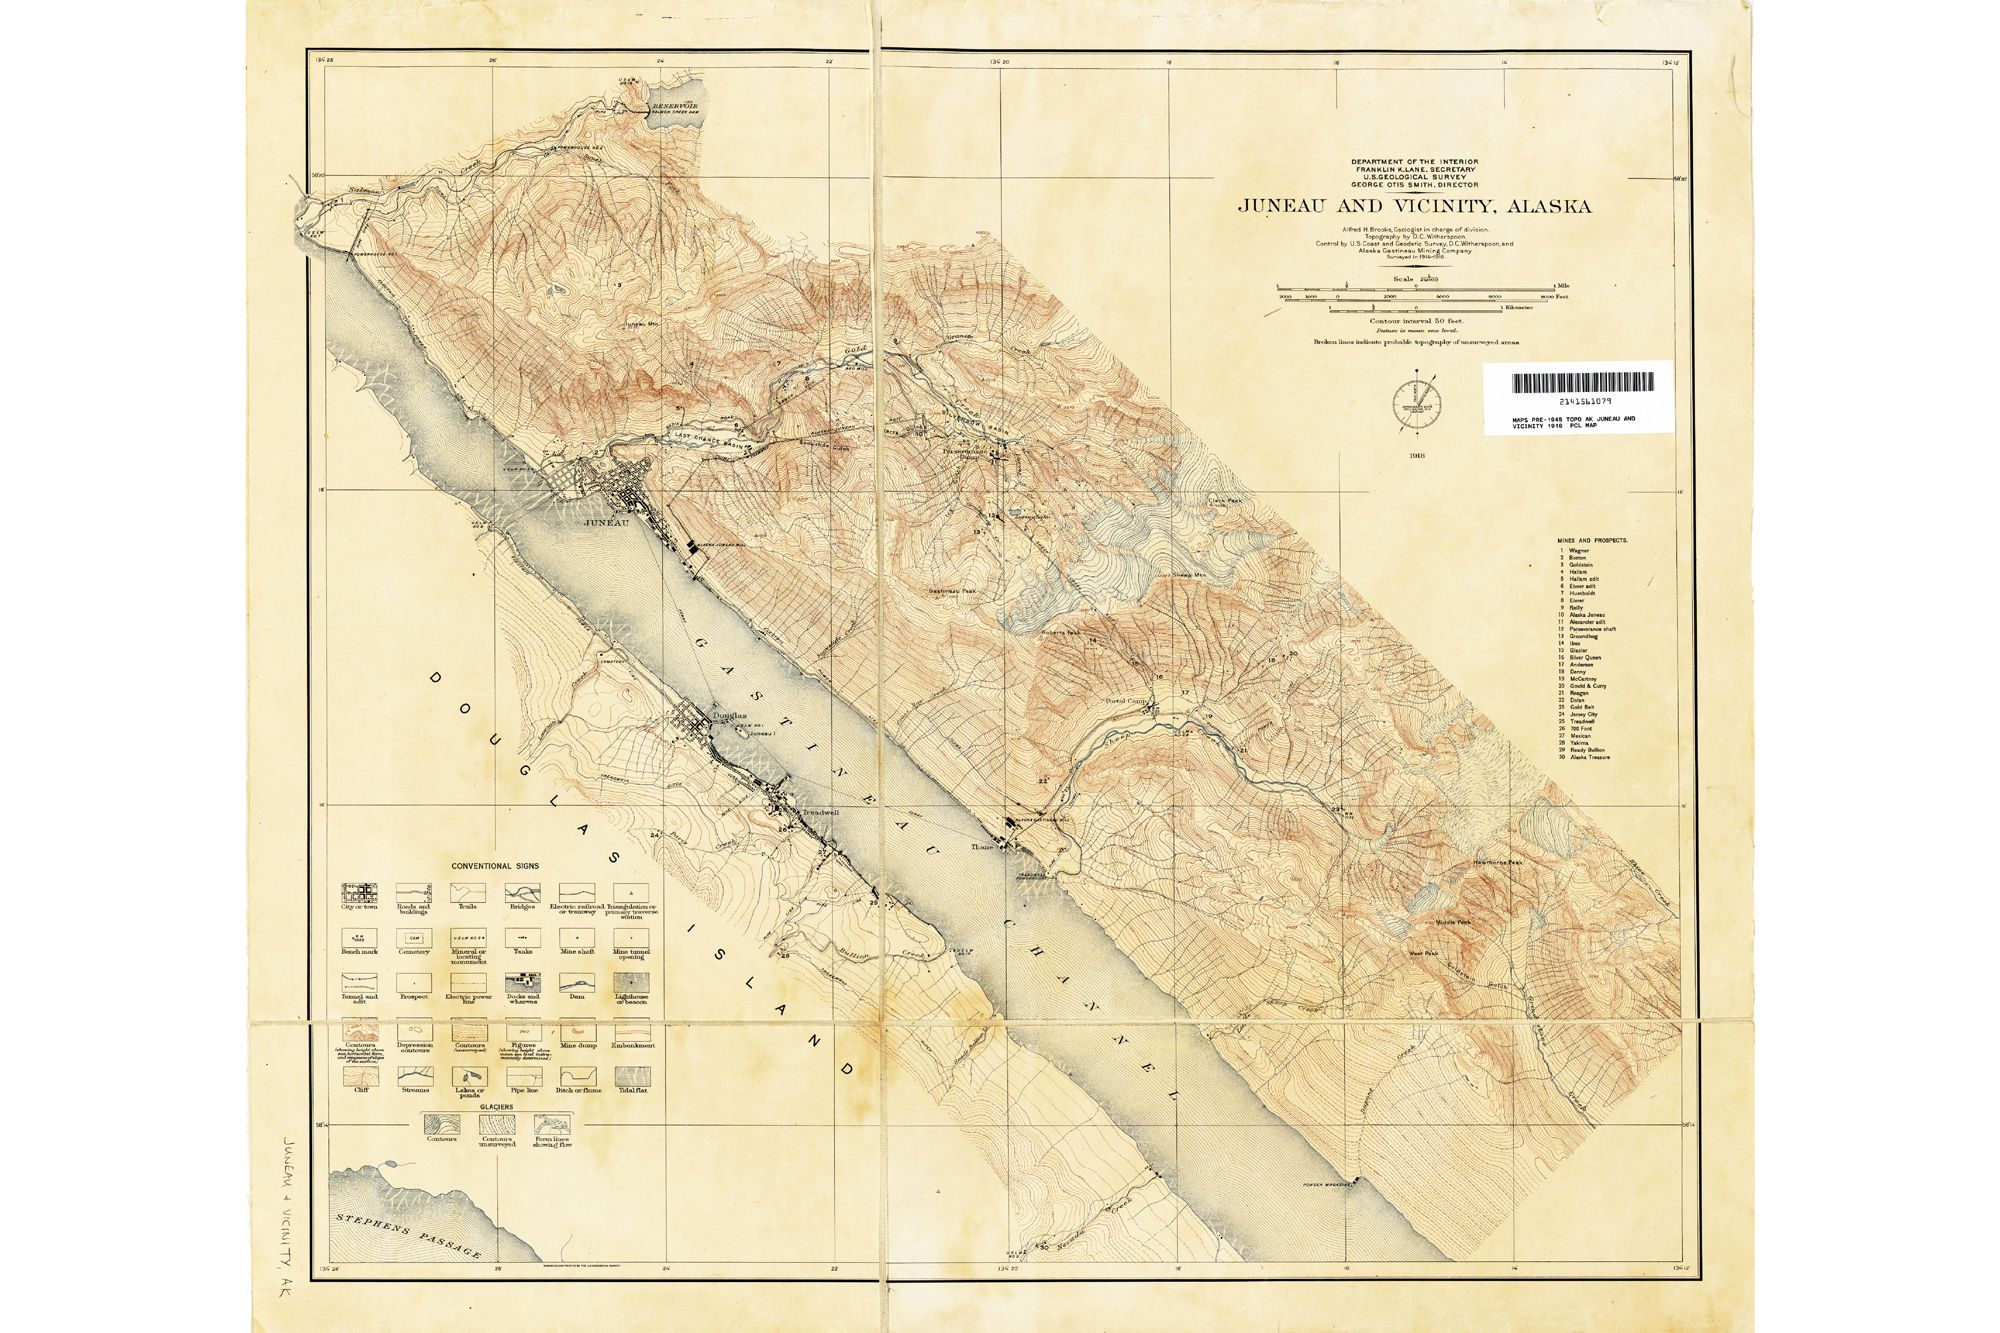 Alaska Topographic Maps, USGS - ATLAS OF PLACES   CARTOGRAPHY ...